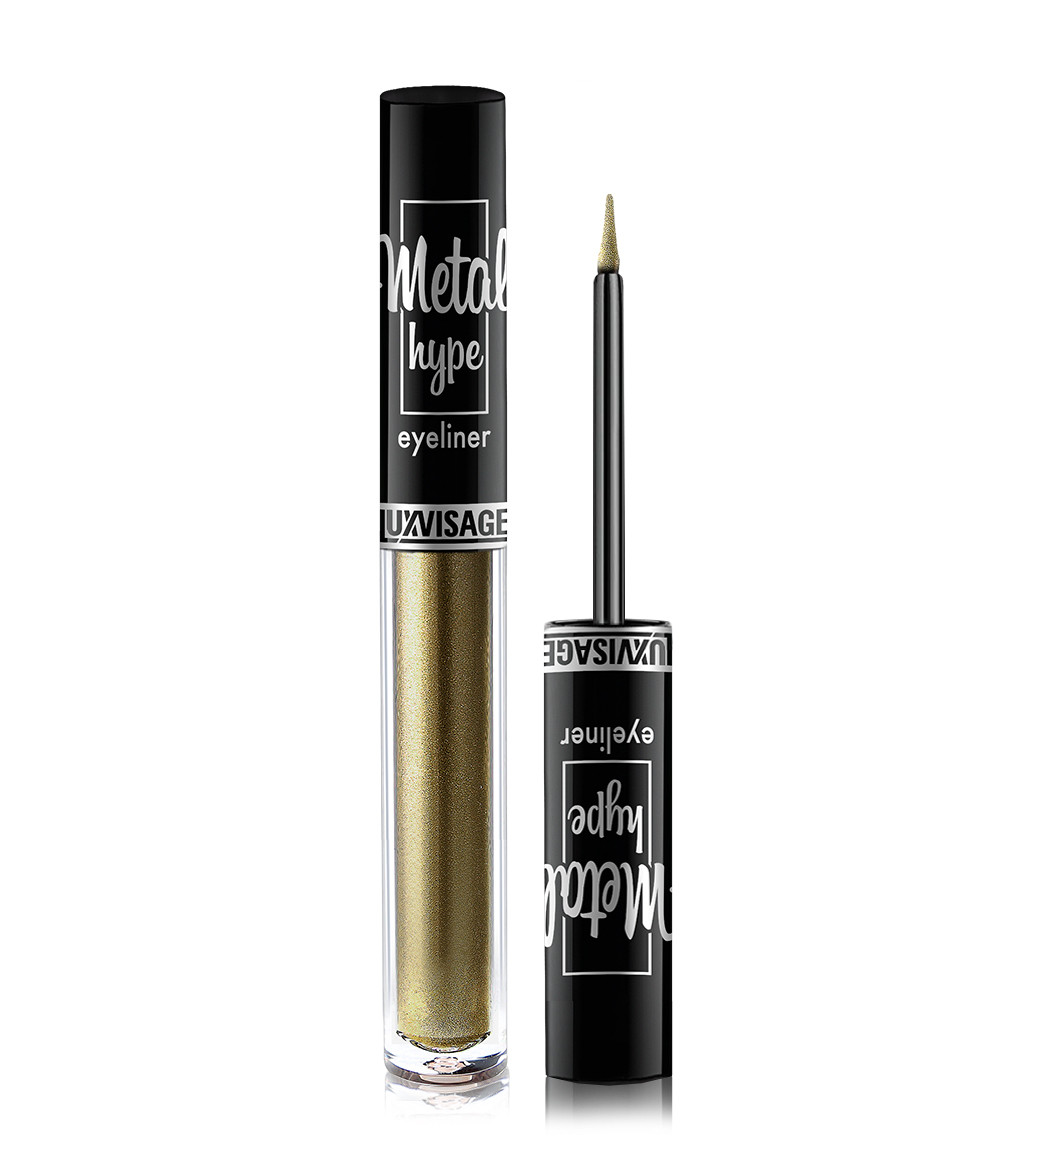 Кольорова підводка для очей Luxvisage Metal Hype Eyeliner №05 Olive Sparks